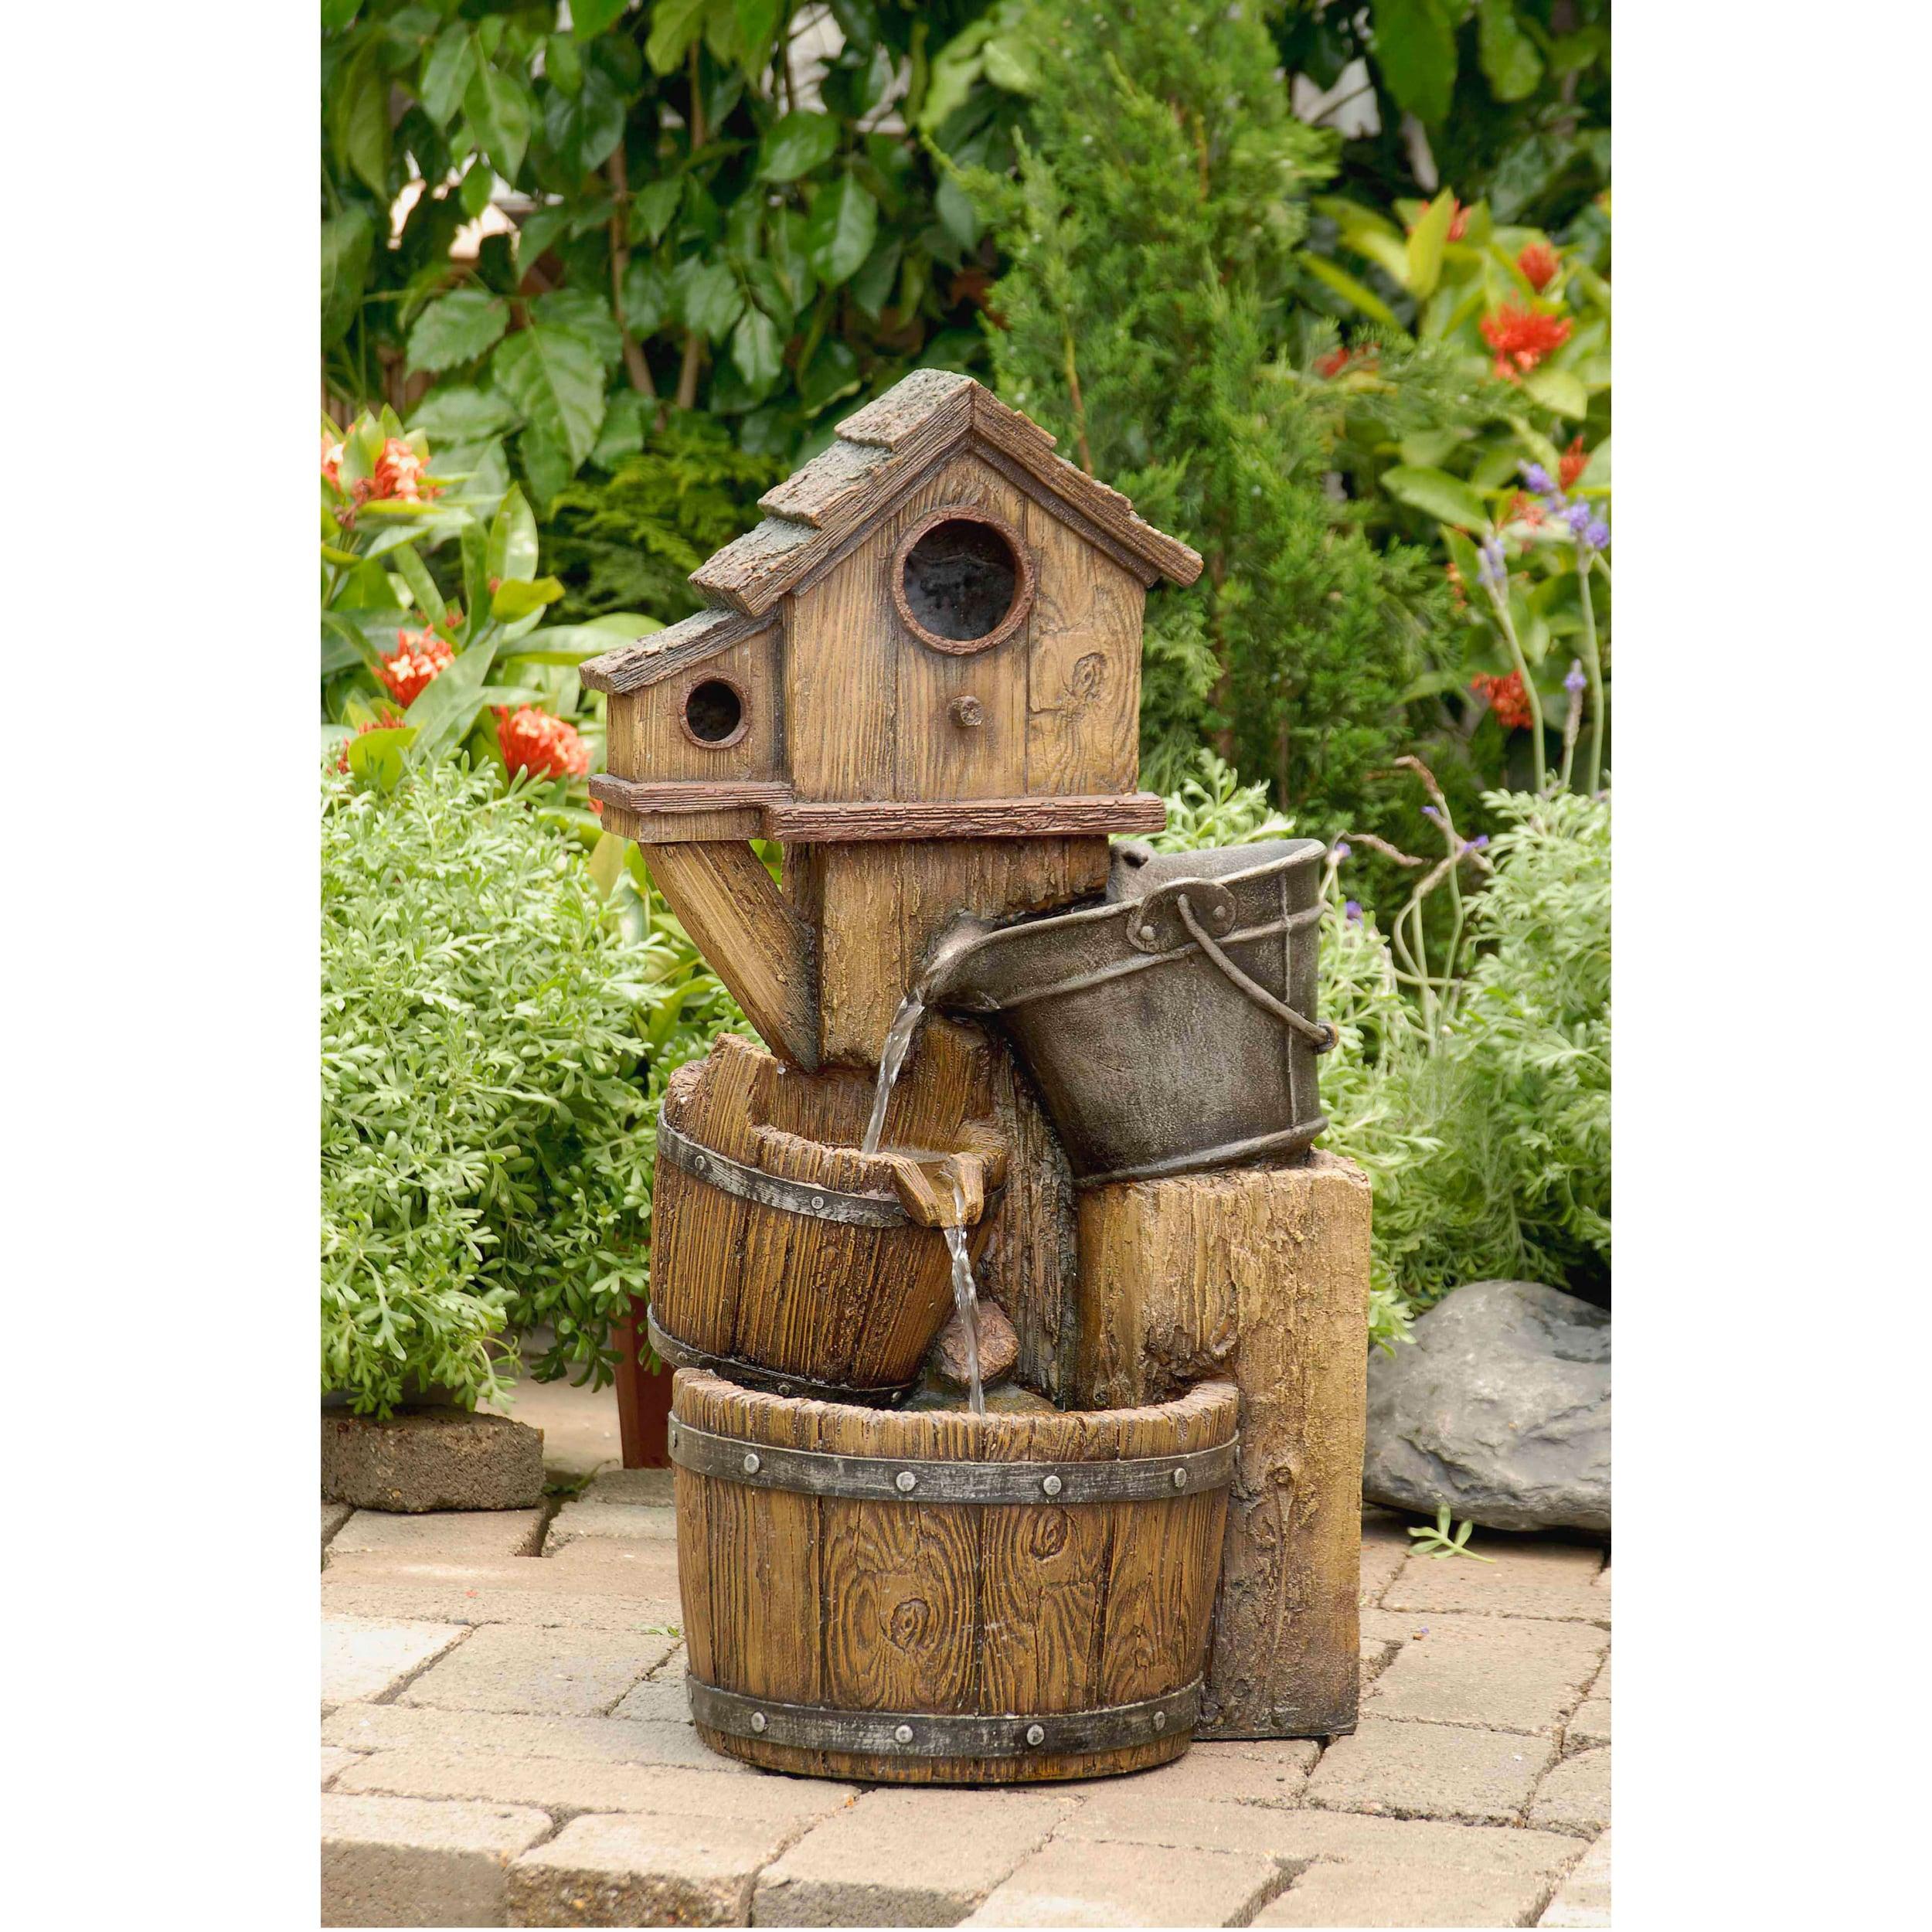 Rustic bird house outdoor water fountain overstock - Small outdoor water fountain ...